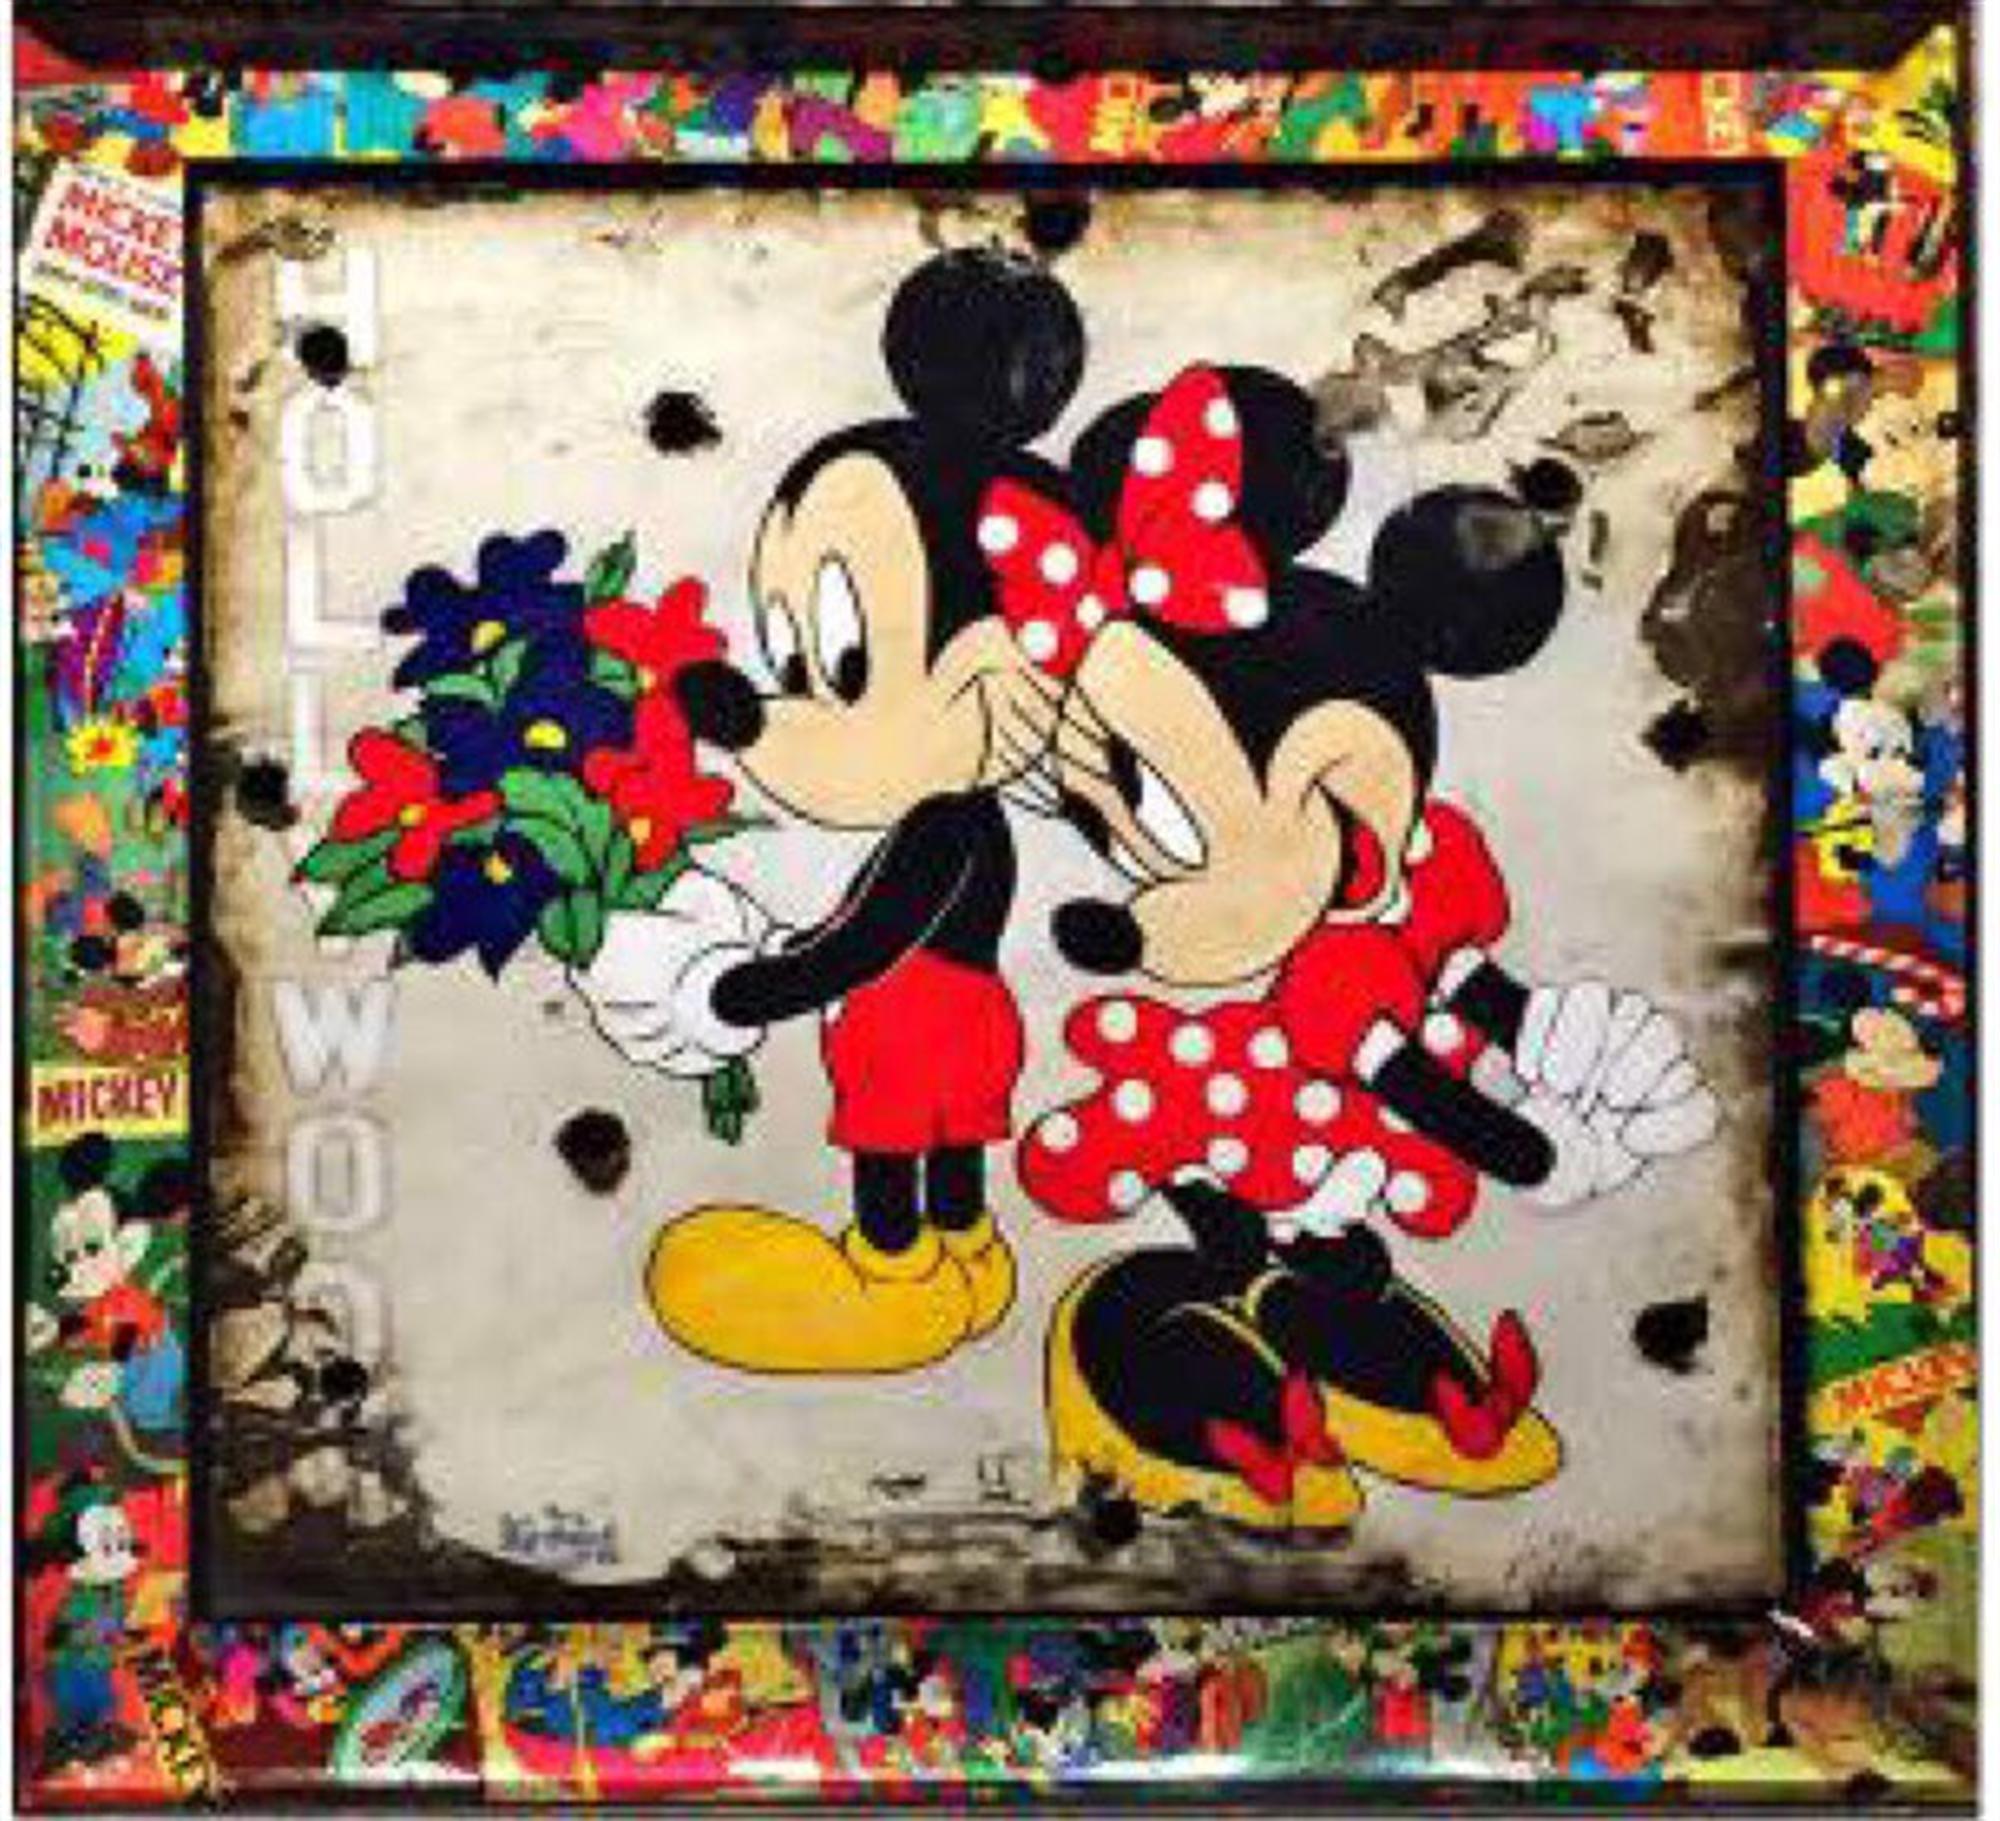 Mickey and Minnie with Walt Disney Signature- Original SOLD by Bill Mack